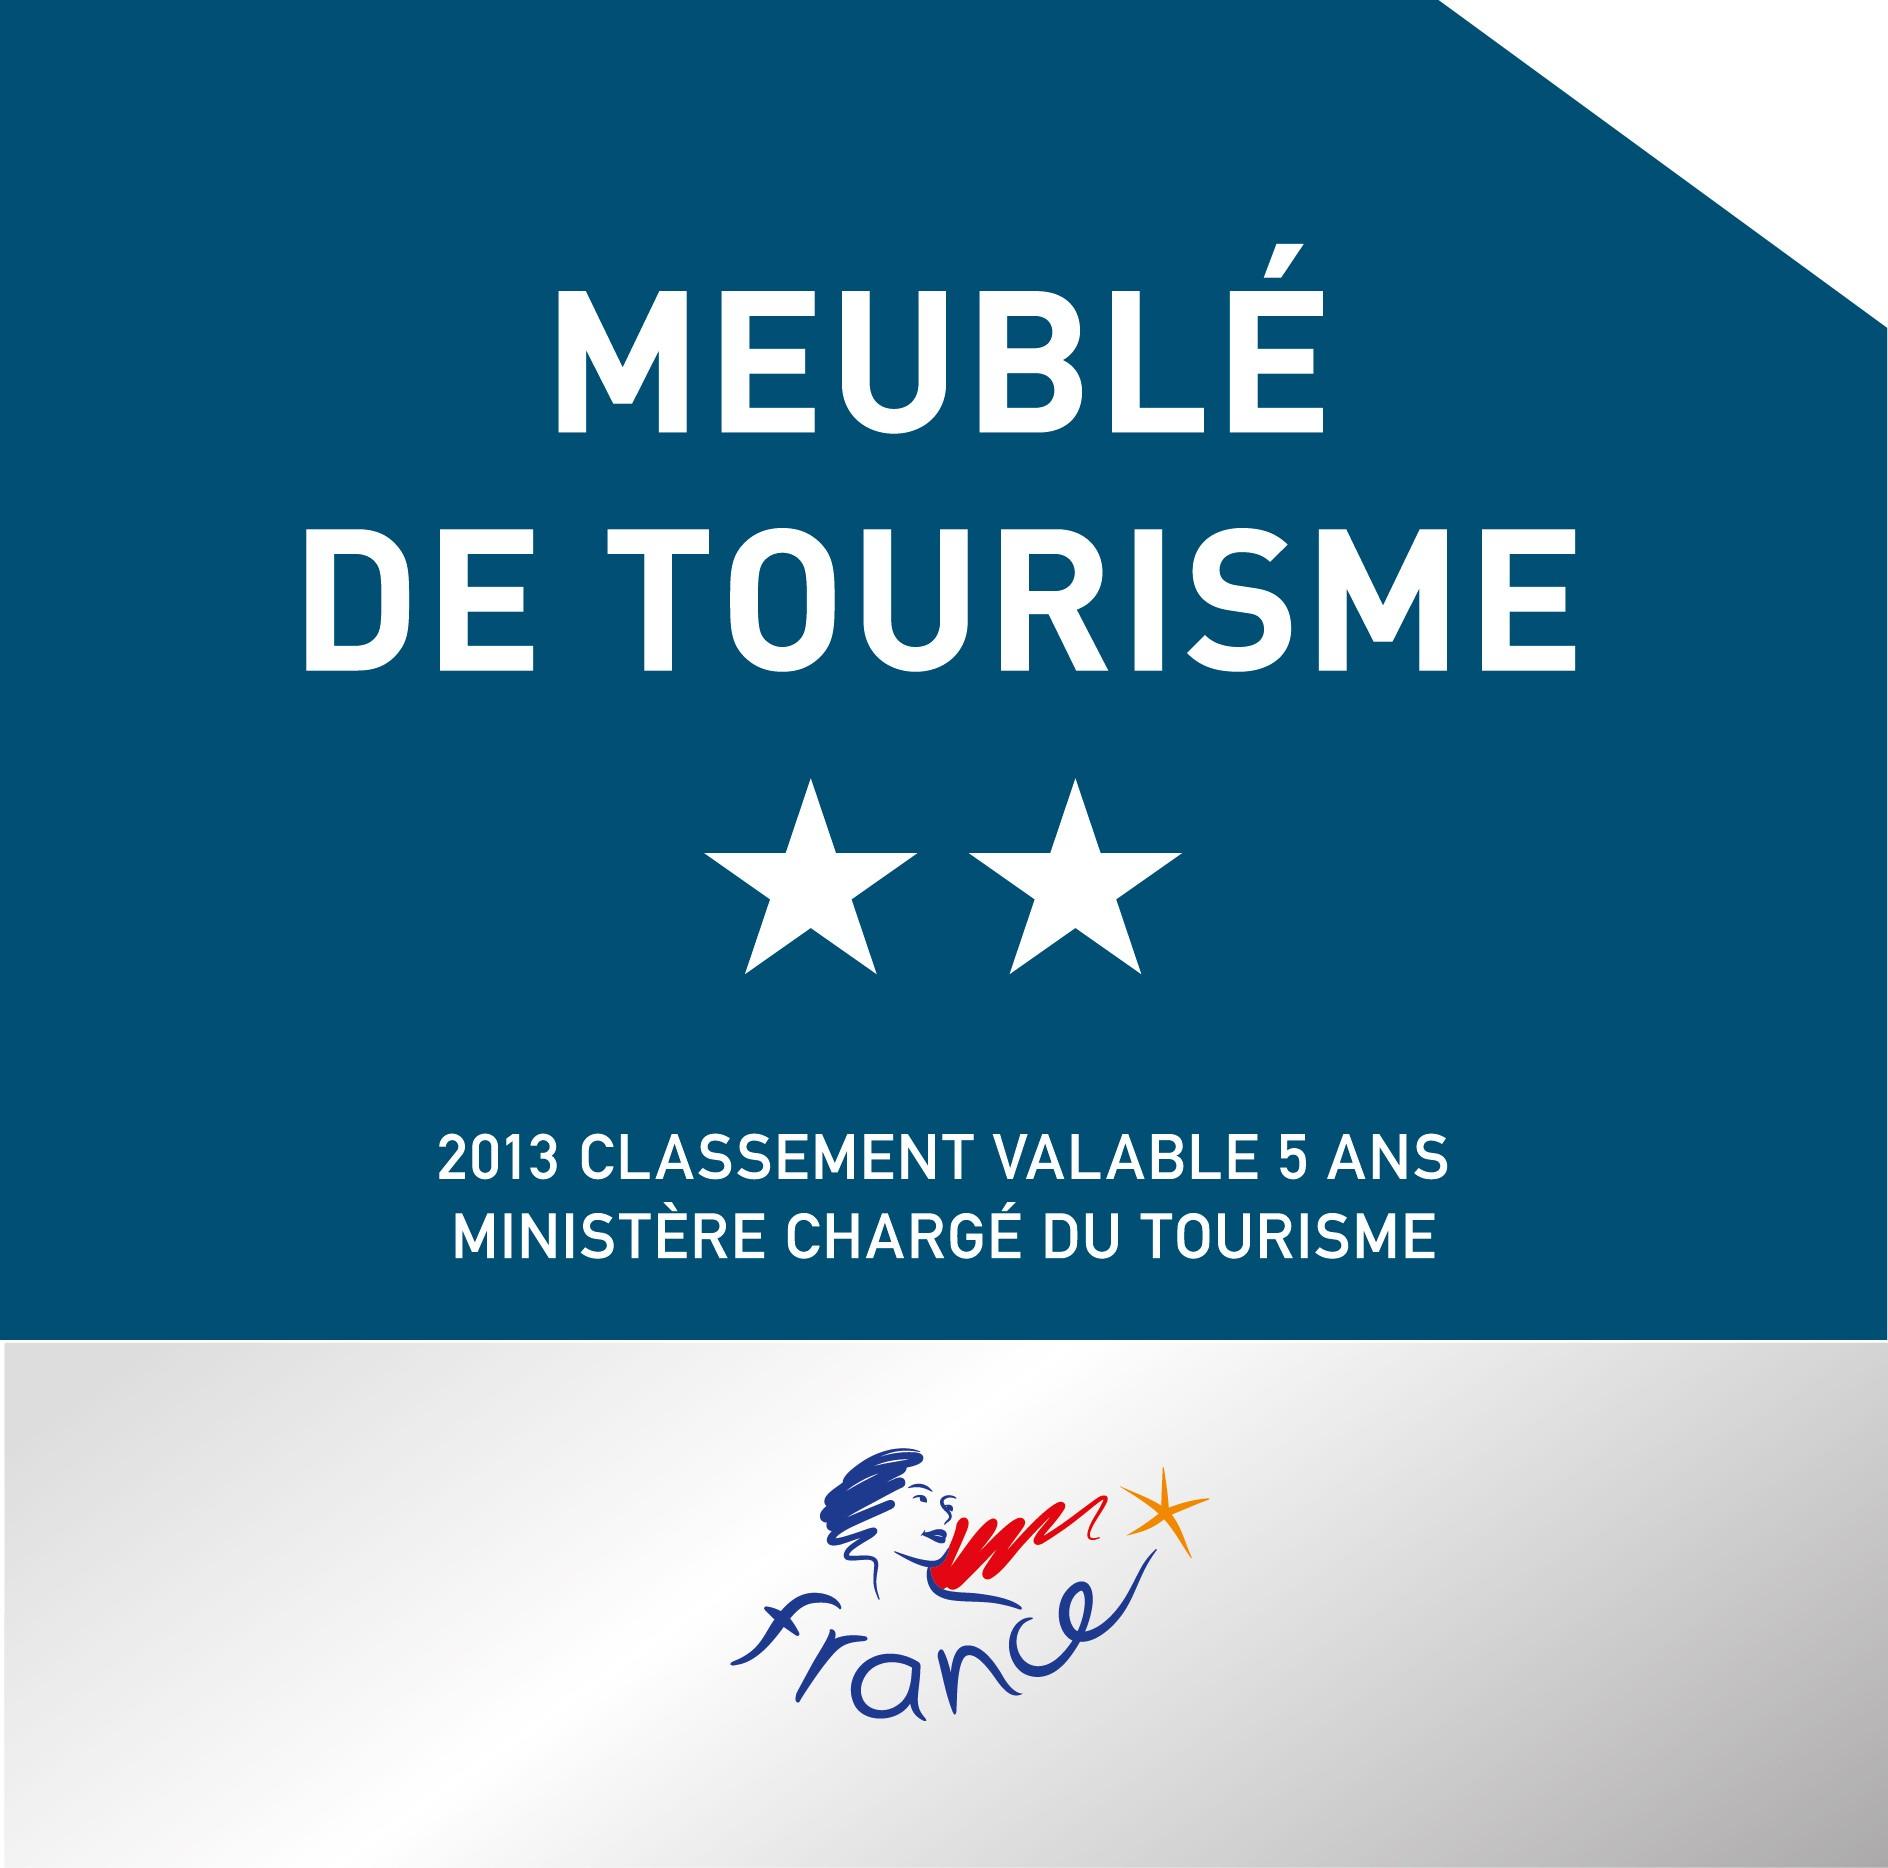 plaque-meuble-tourisme2-13-11628